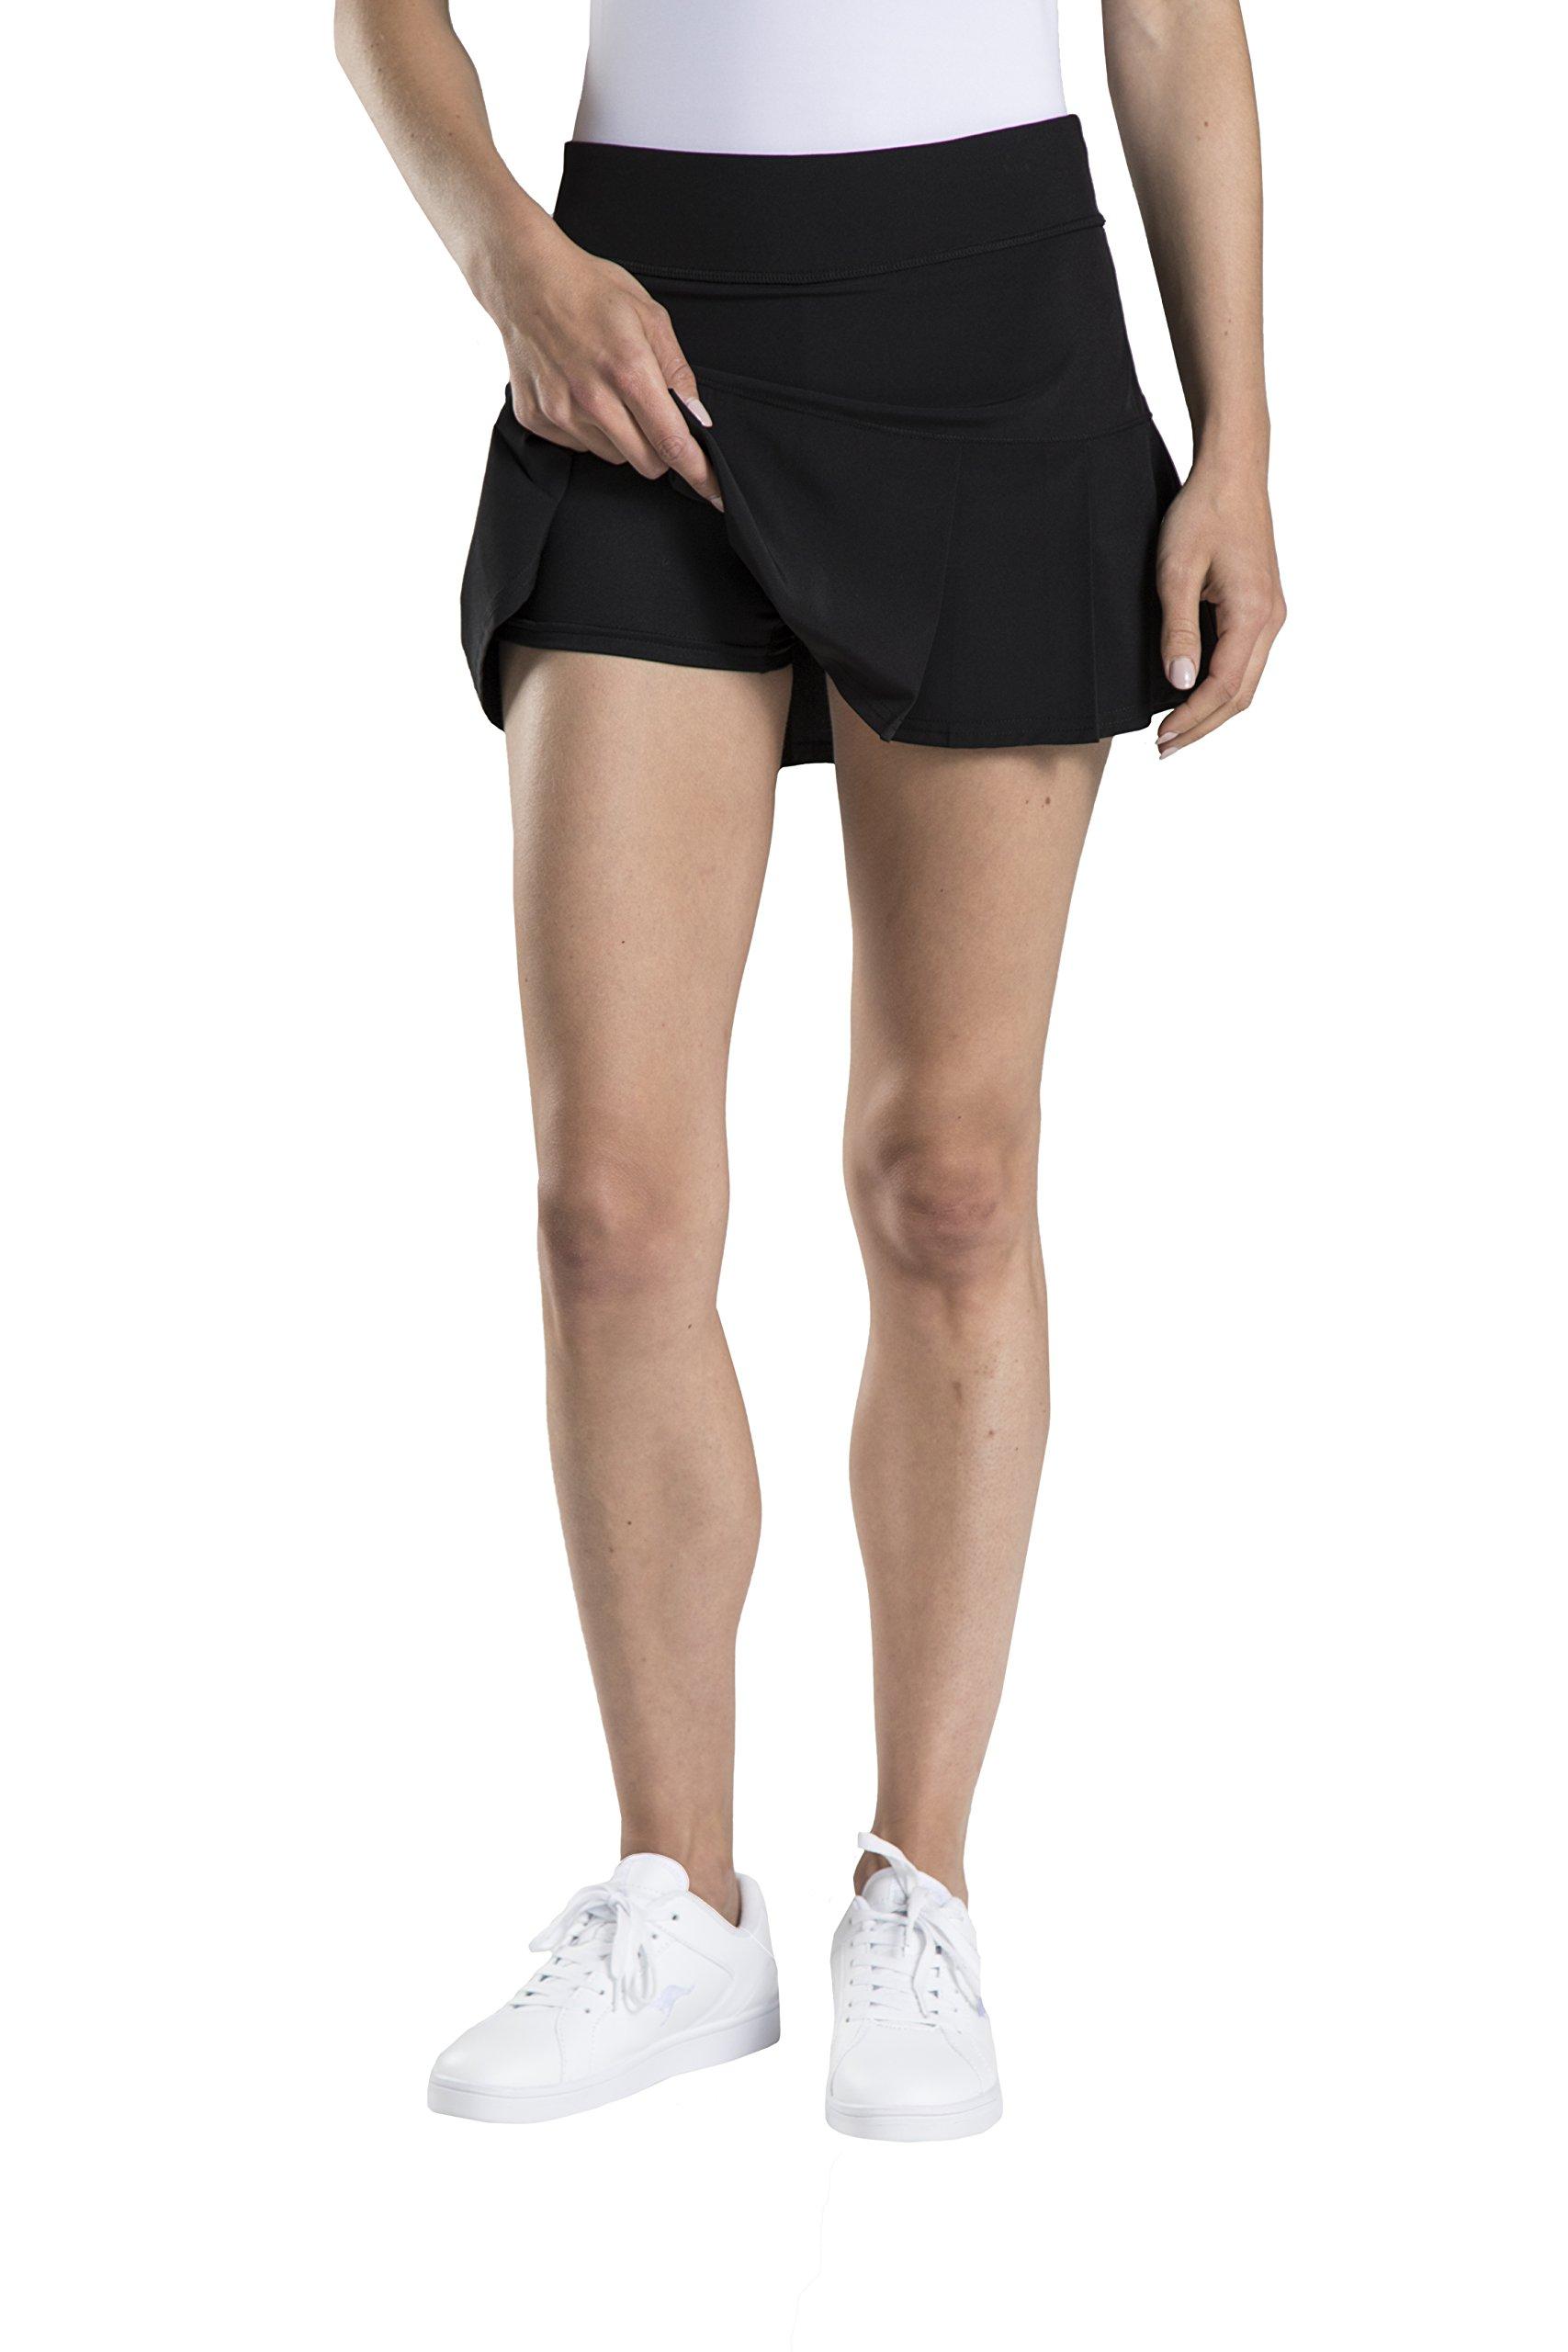 Etonic Women's Stretch Woven Tennis Skort, Black, X-Small